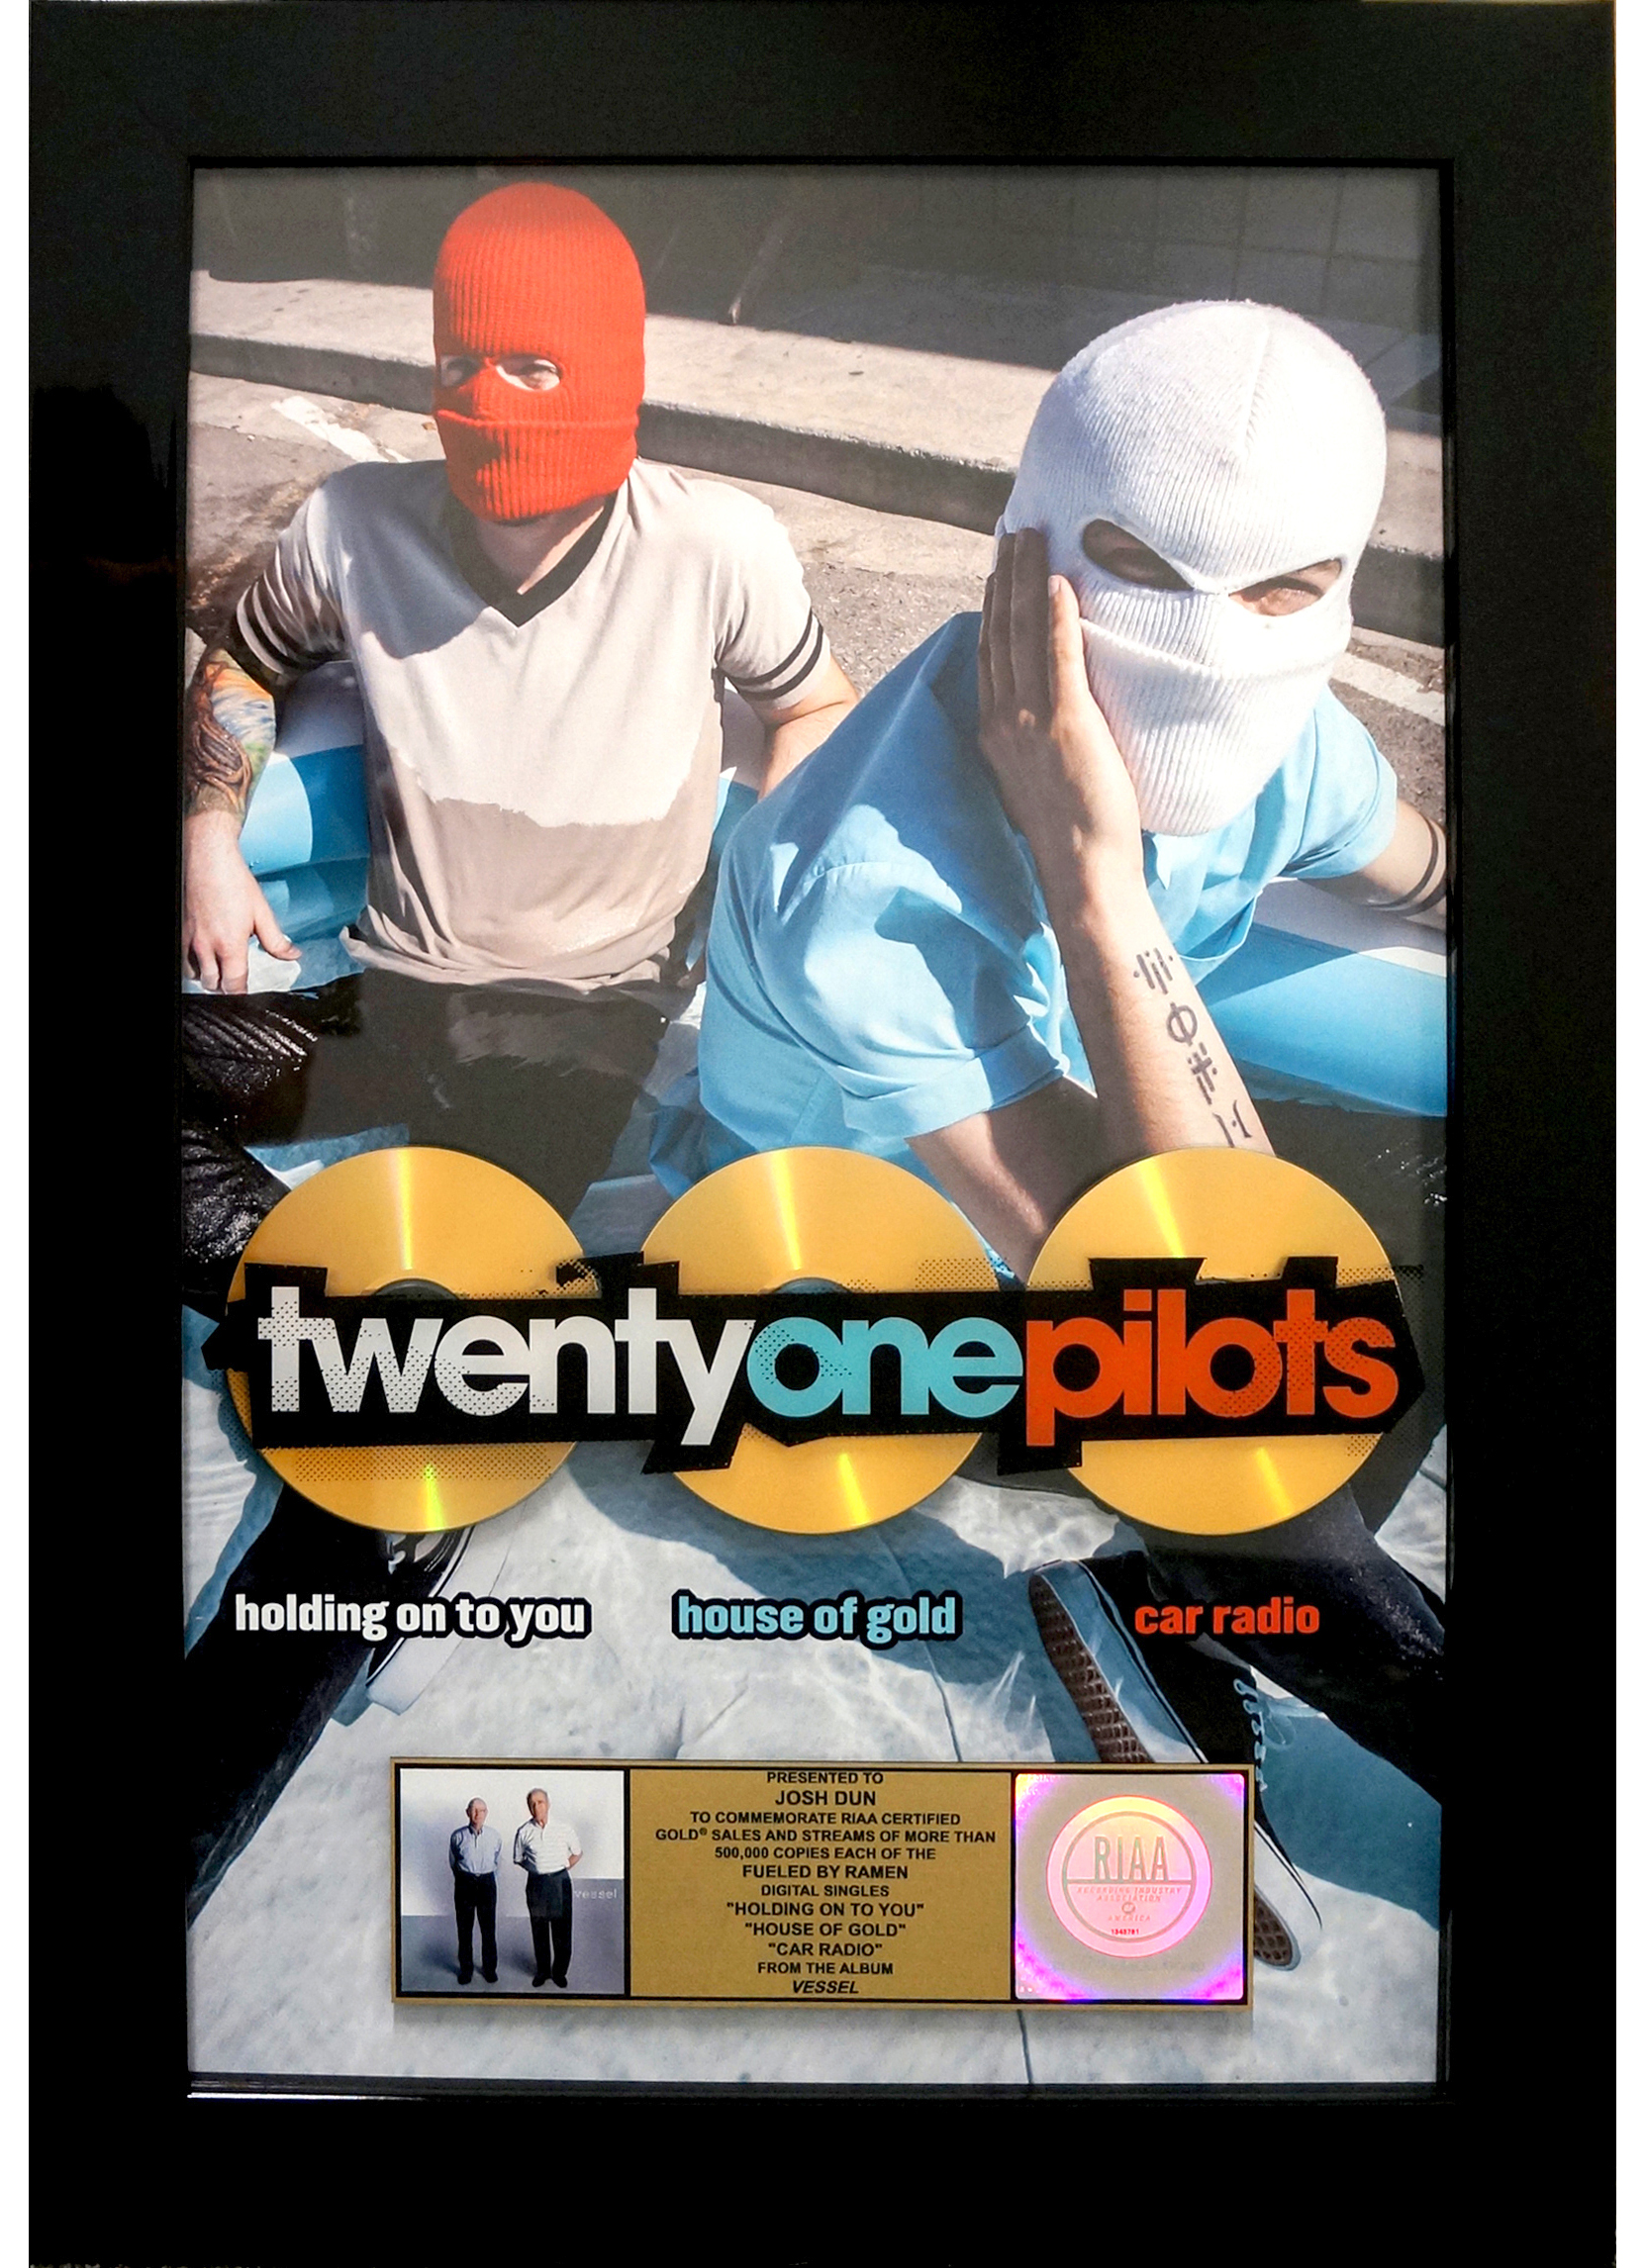 21 Pilots - Vessel Josh Dun.jpg